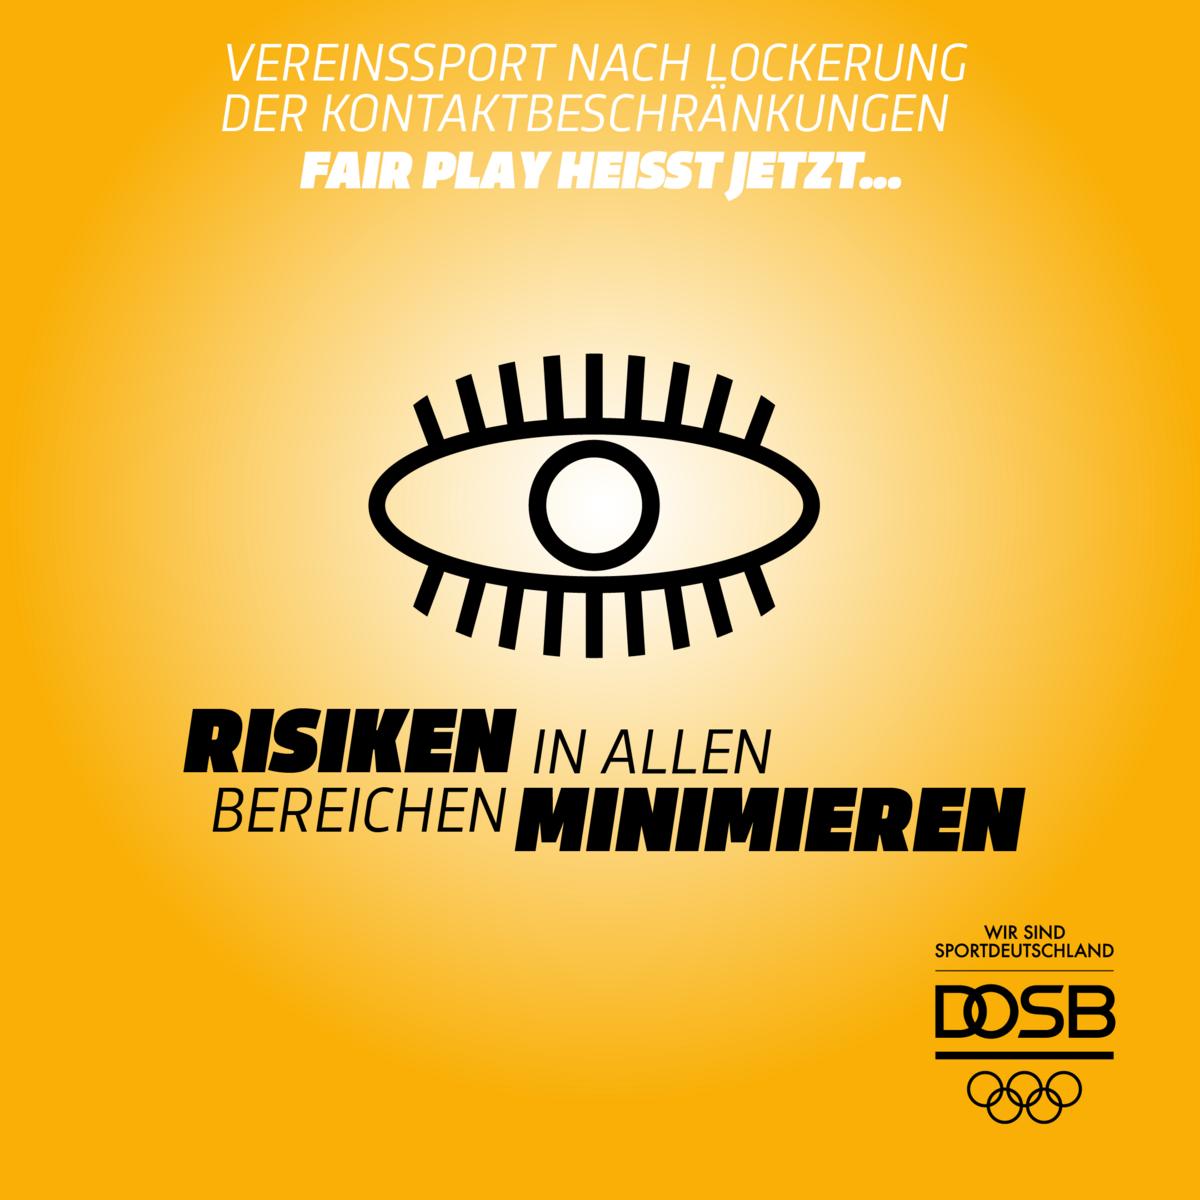 csm_Leitplanken-10_2x_9f03a2f032